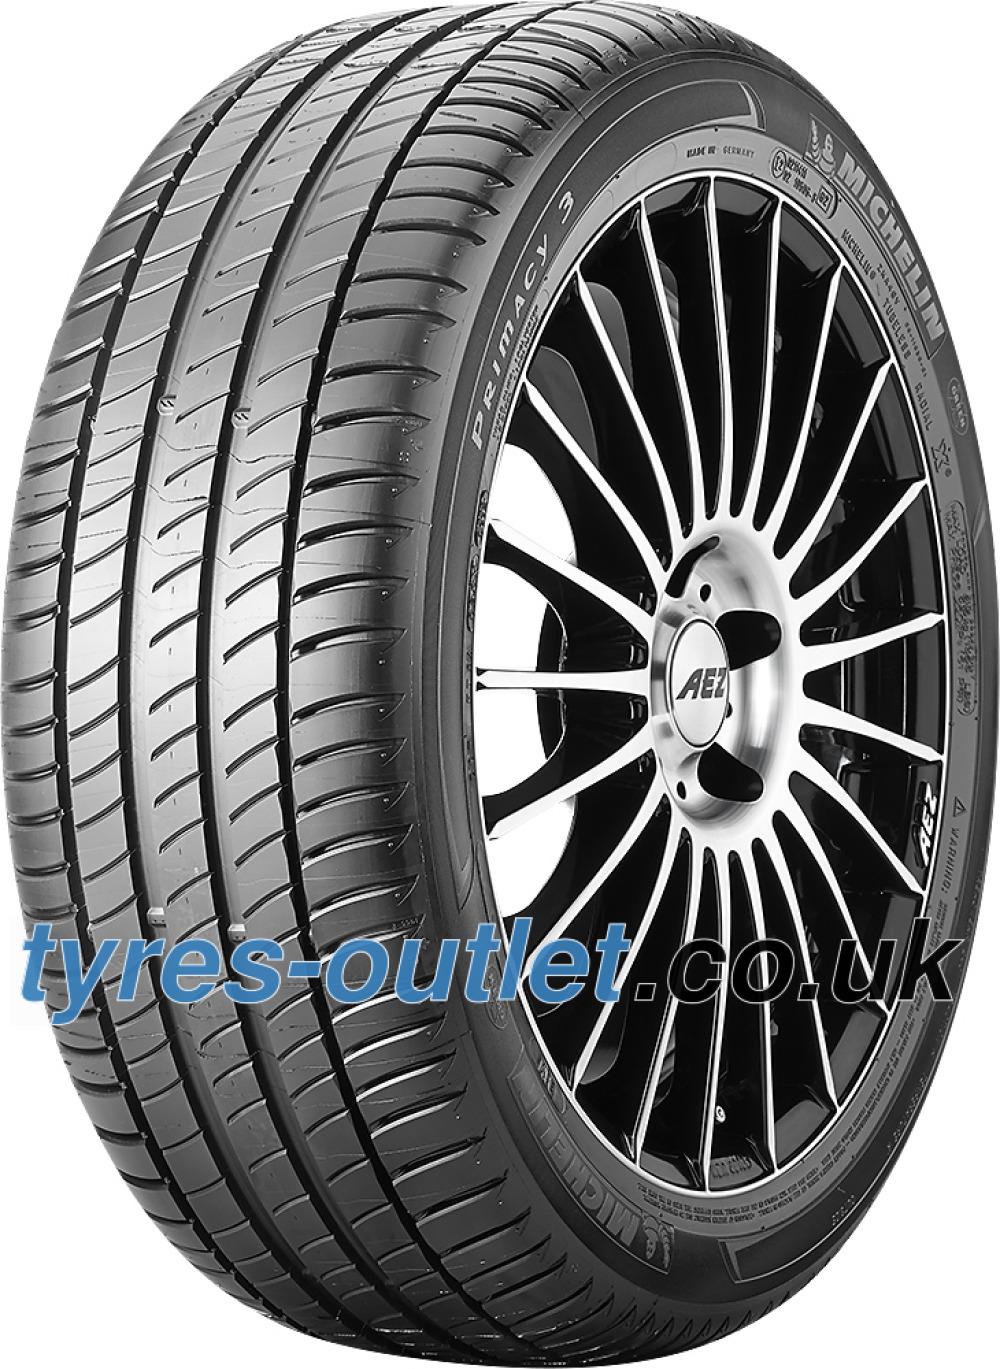 Michelin Primacy 3 ( 225/55 R16 95V with rim protection ridge (FSL) )